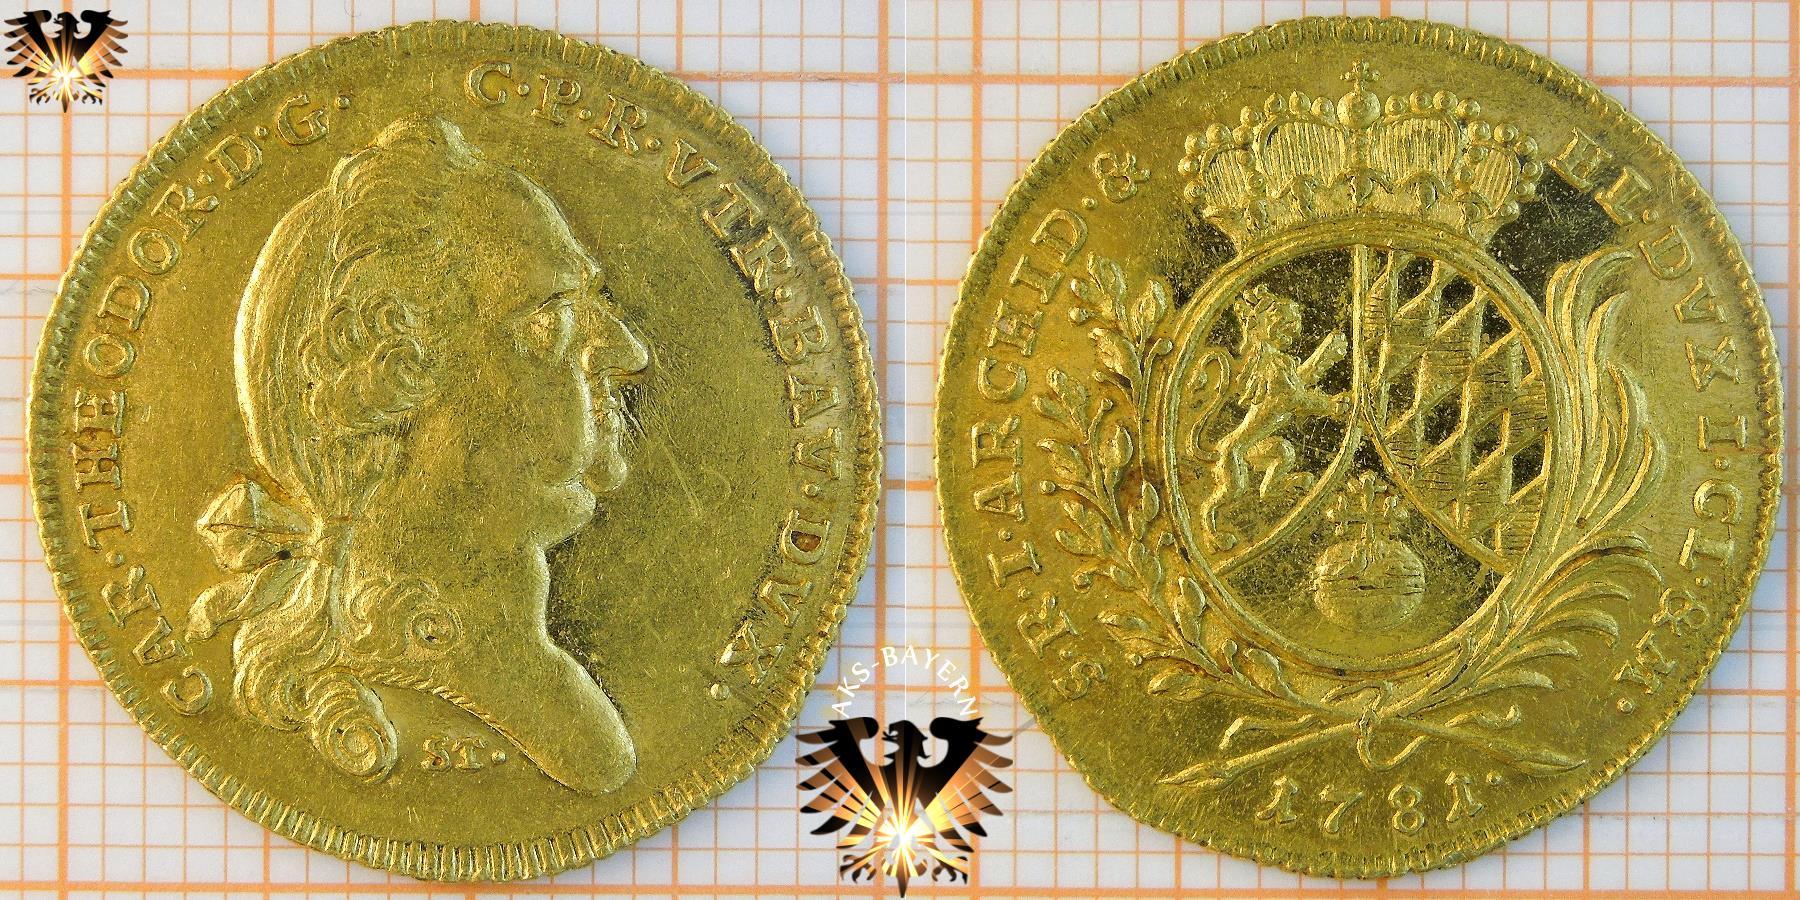 Franc Ios I D G Avstriae Imperator 1915 1 Dukat Doppelmonarchie